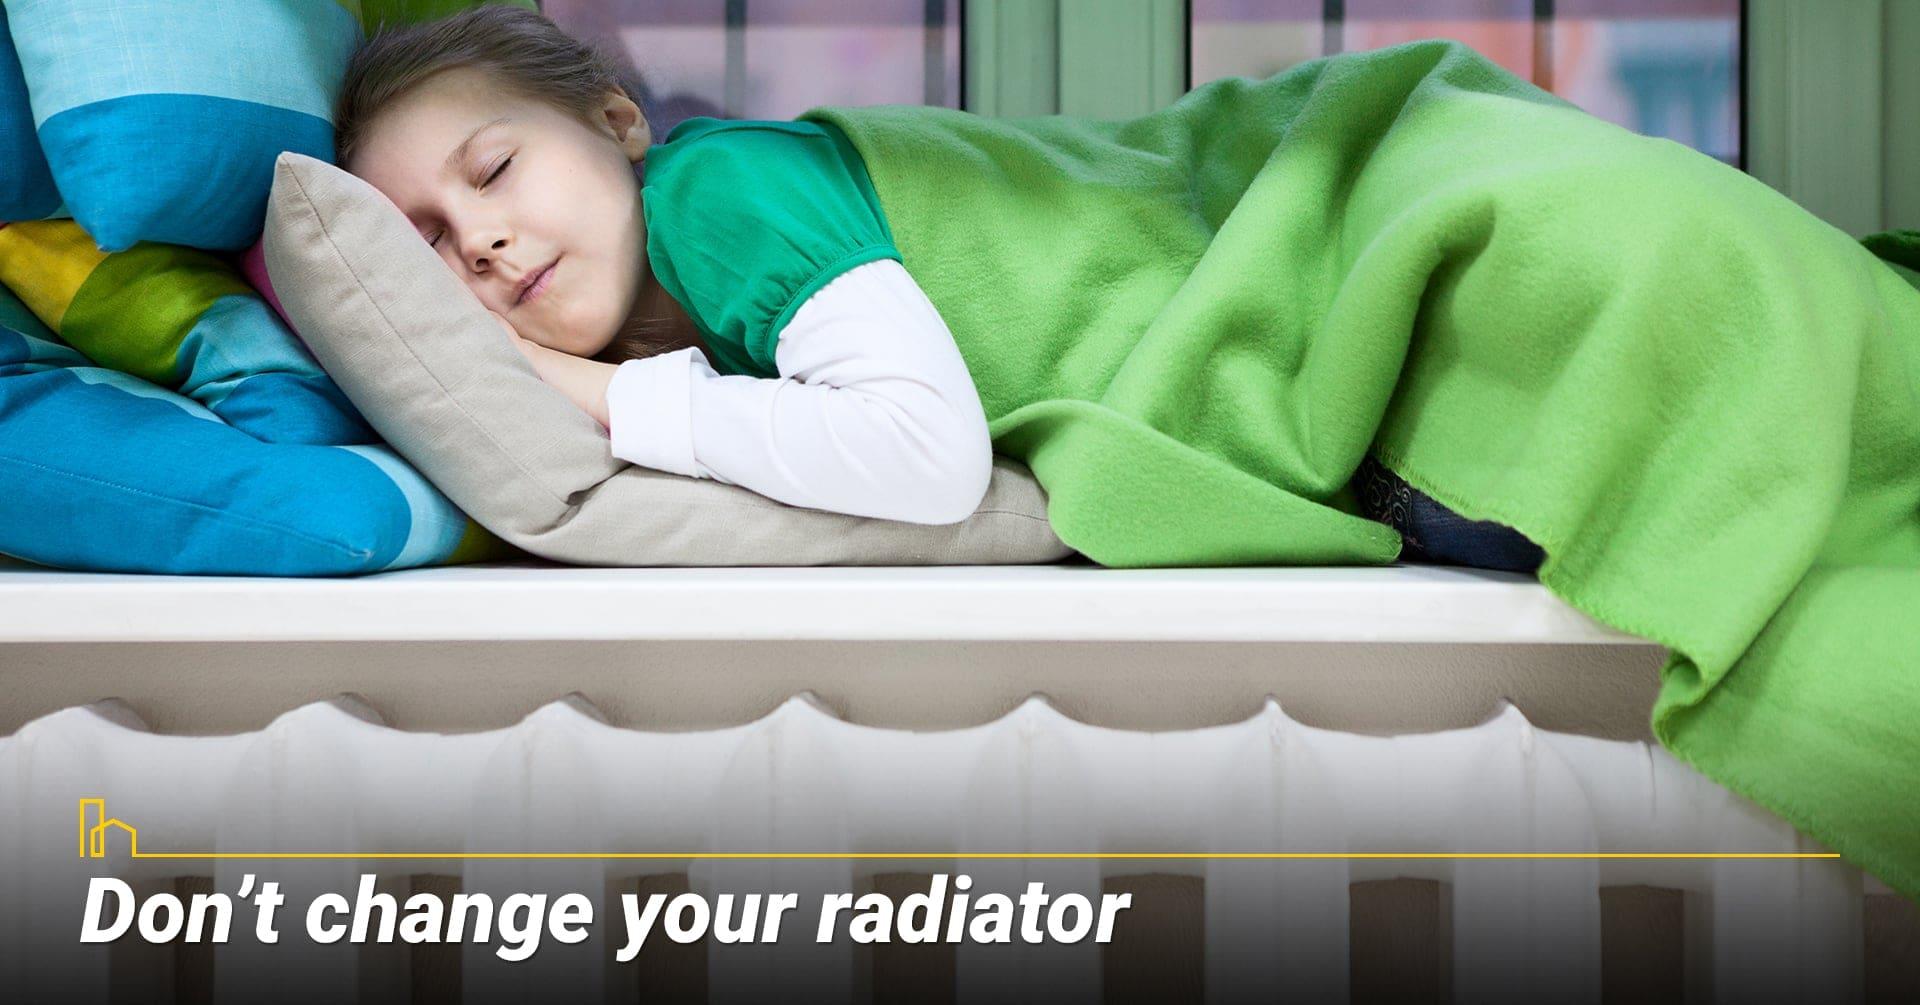 Don't change your radiator, keep your radiator